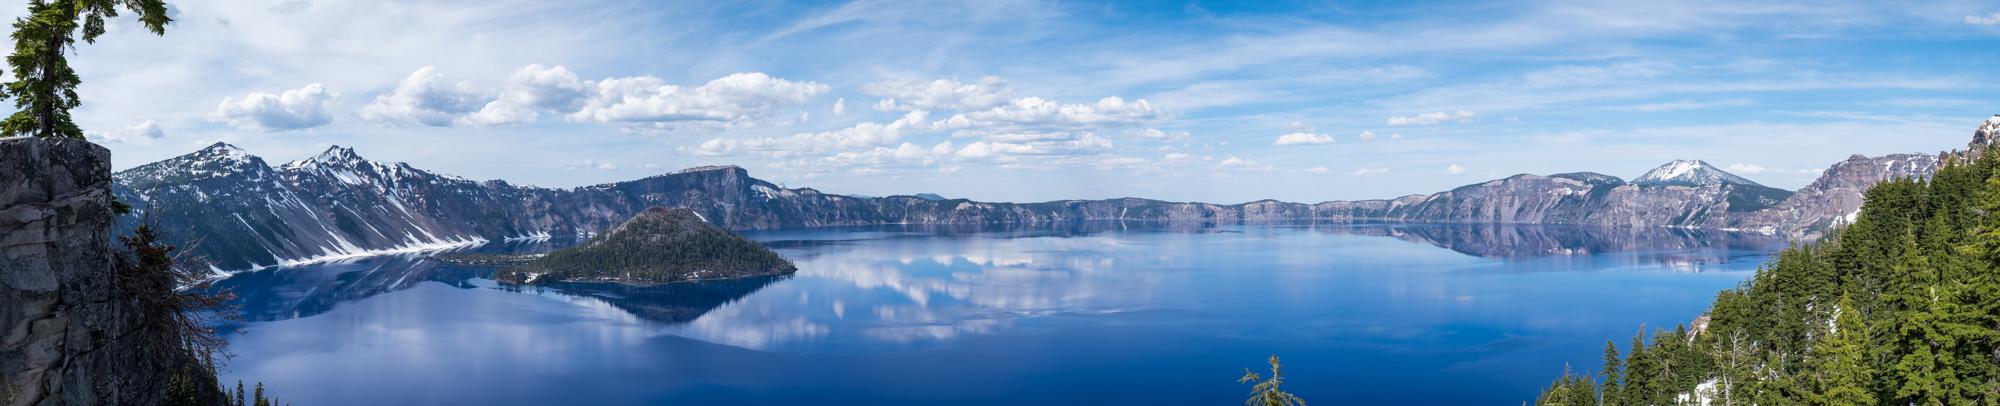 Crater Lake National Park - 015.jpg